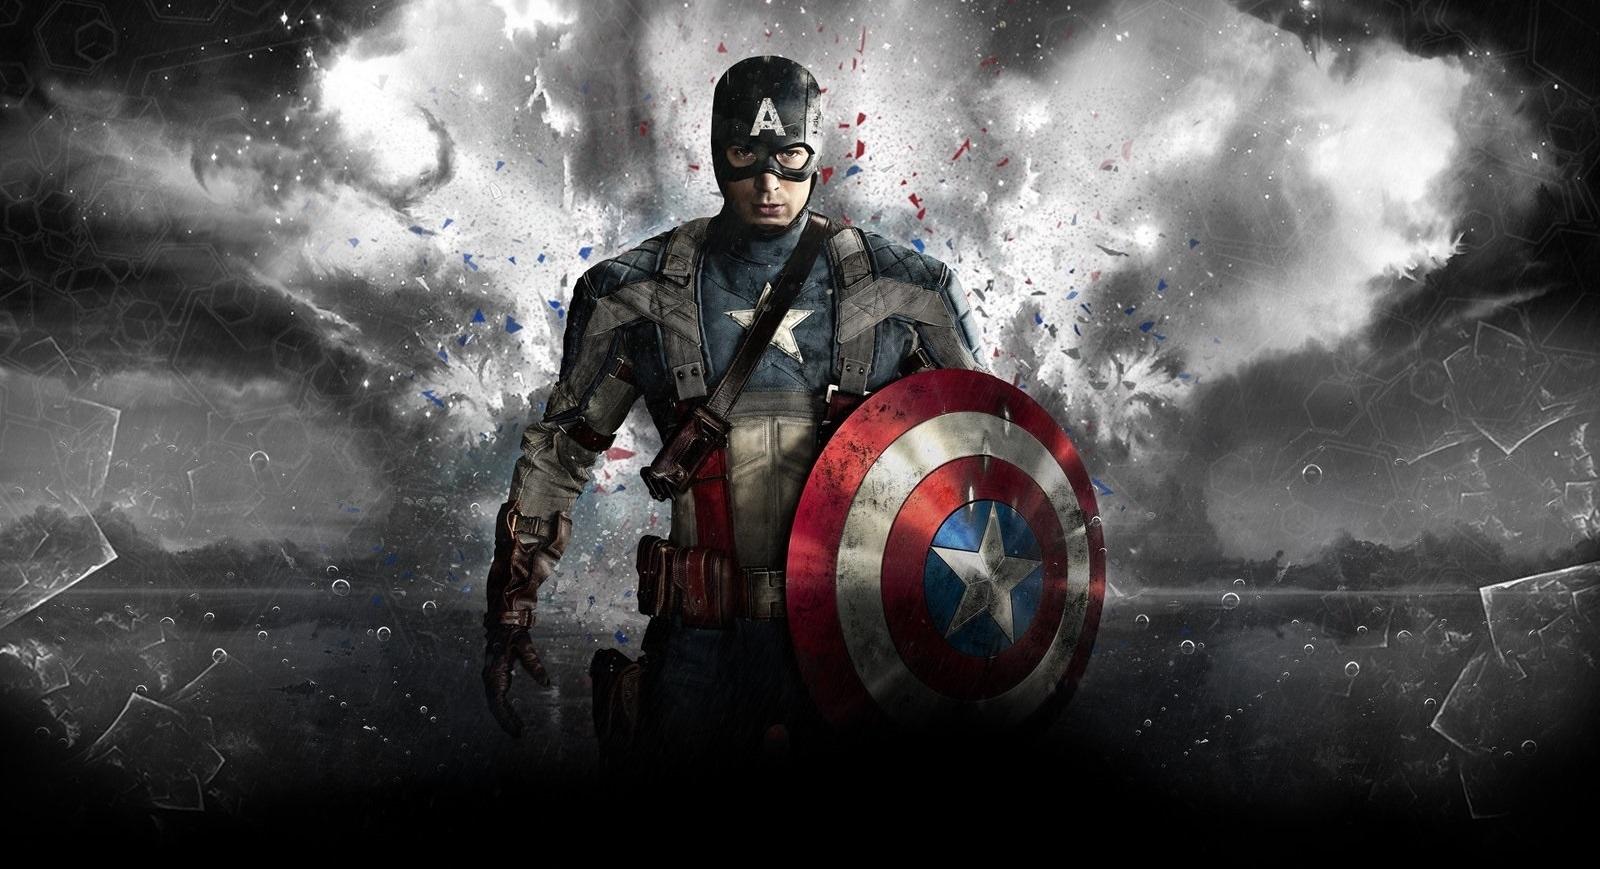 10 Latest Captain America Hd Wallpaper Full Hd 1920 1080 For Pc